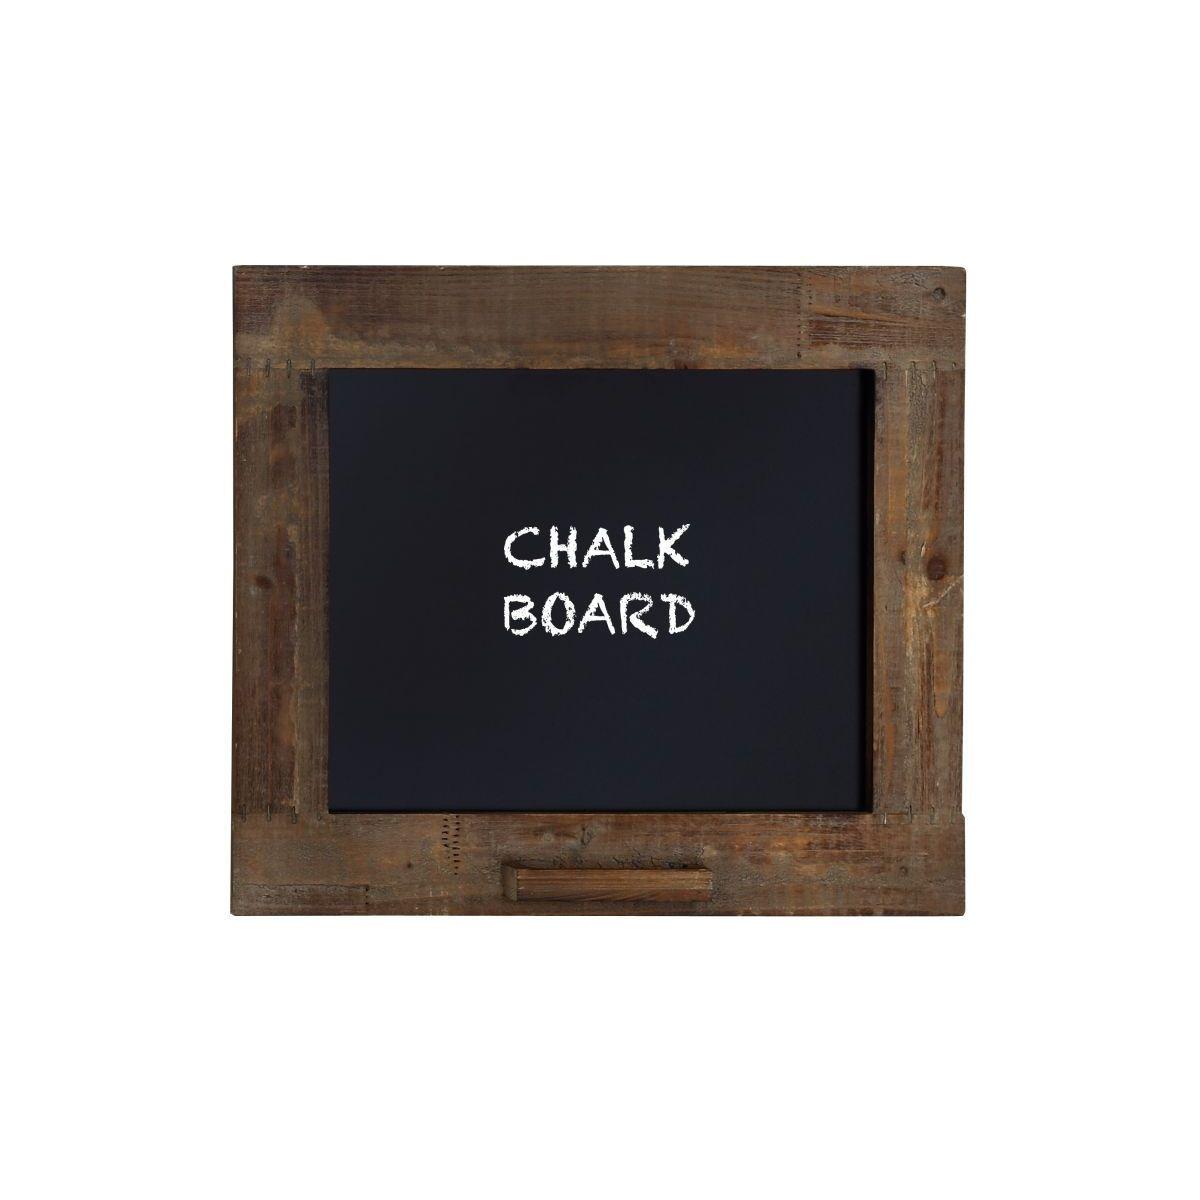 Rustic Walnut Finish Blackboard with Chalk Holder